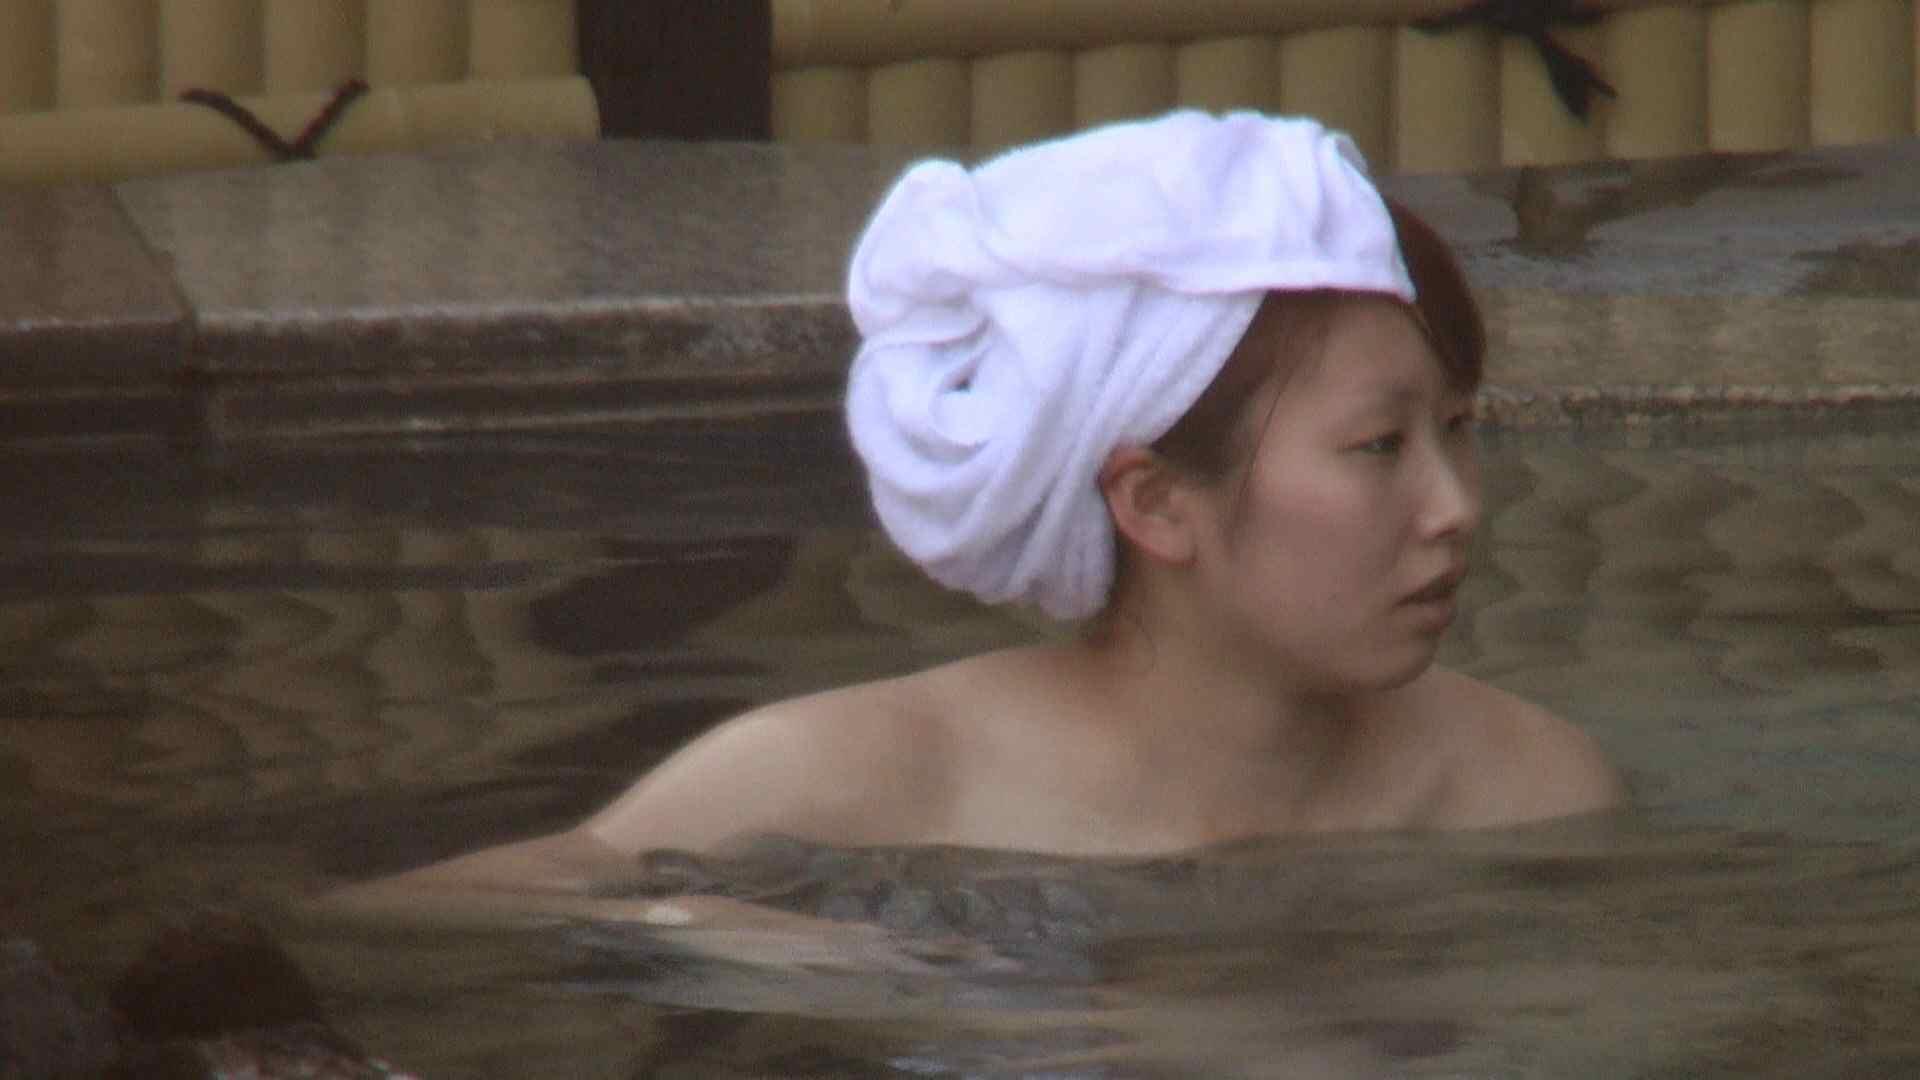 Aquaな露天風呂Vol.210 OL女体   露天  49連発 25